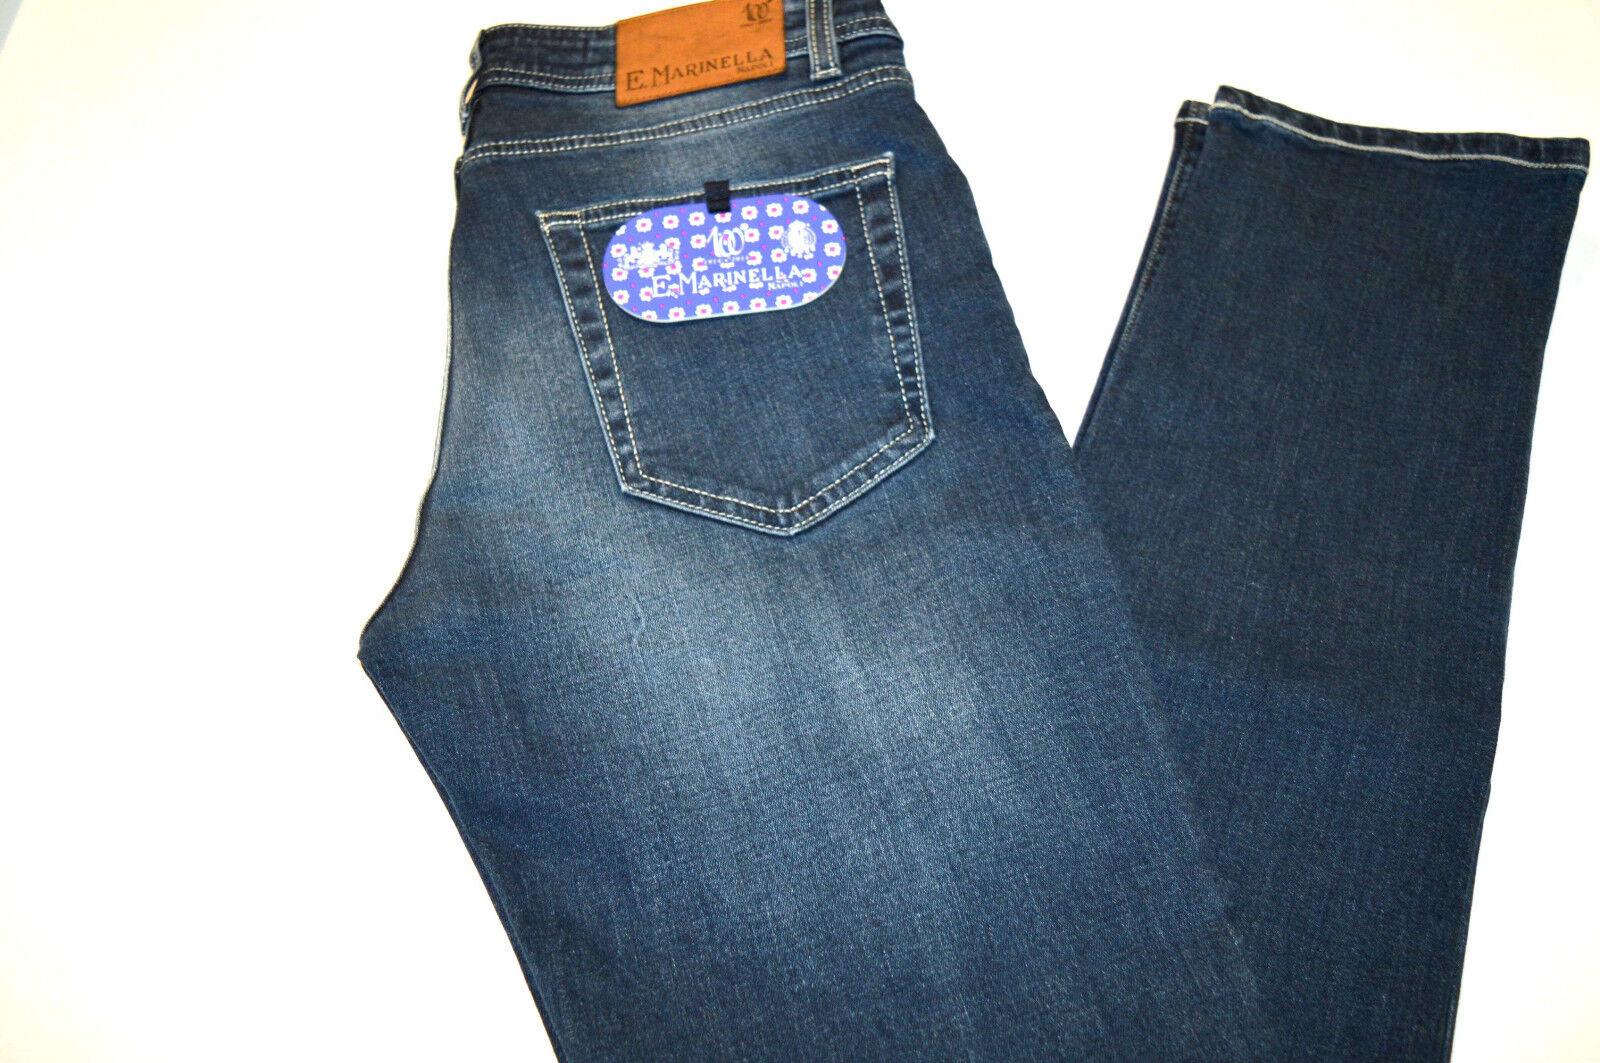 NEW E.MARINELLA 100° Anniversary Jeans Denim Cotton  Elastane Size 35 Us 51 Eu